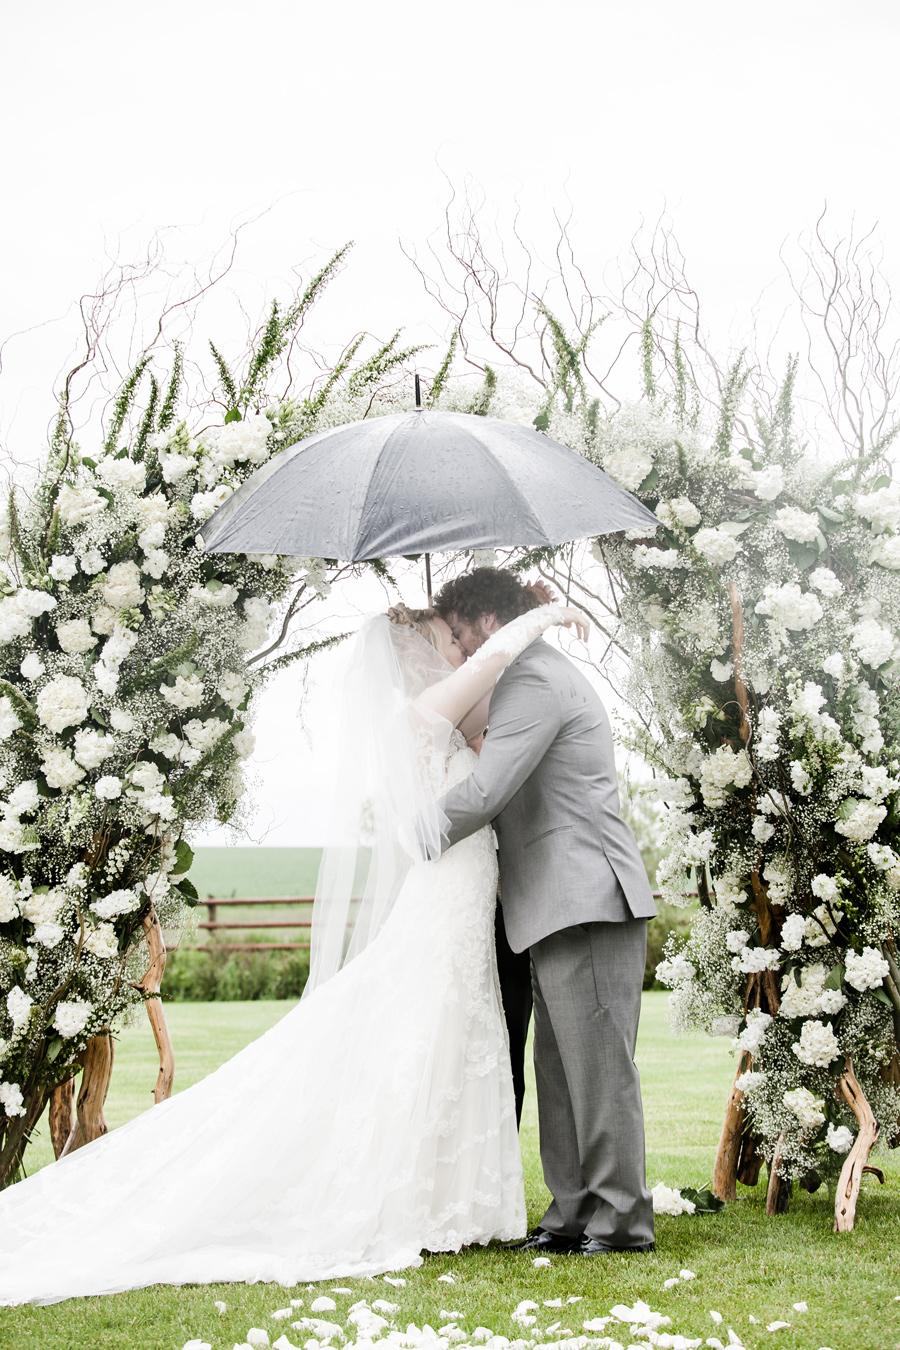 wedding arch by Katalin Green / photography Braden Tenney